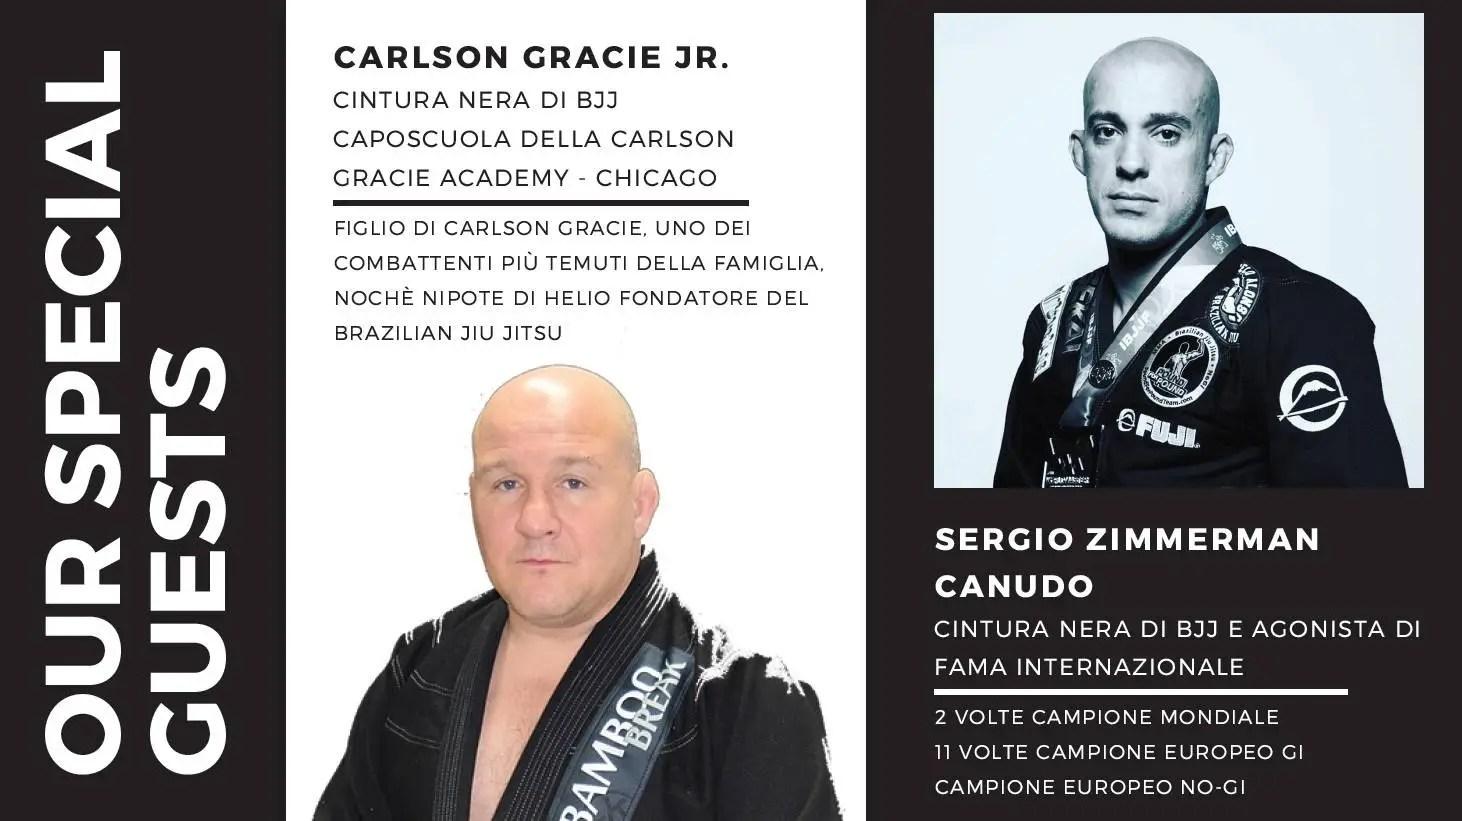 Gracie Jr e Zimmerman Canudo